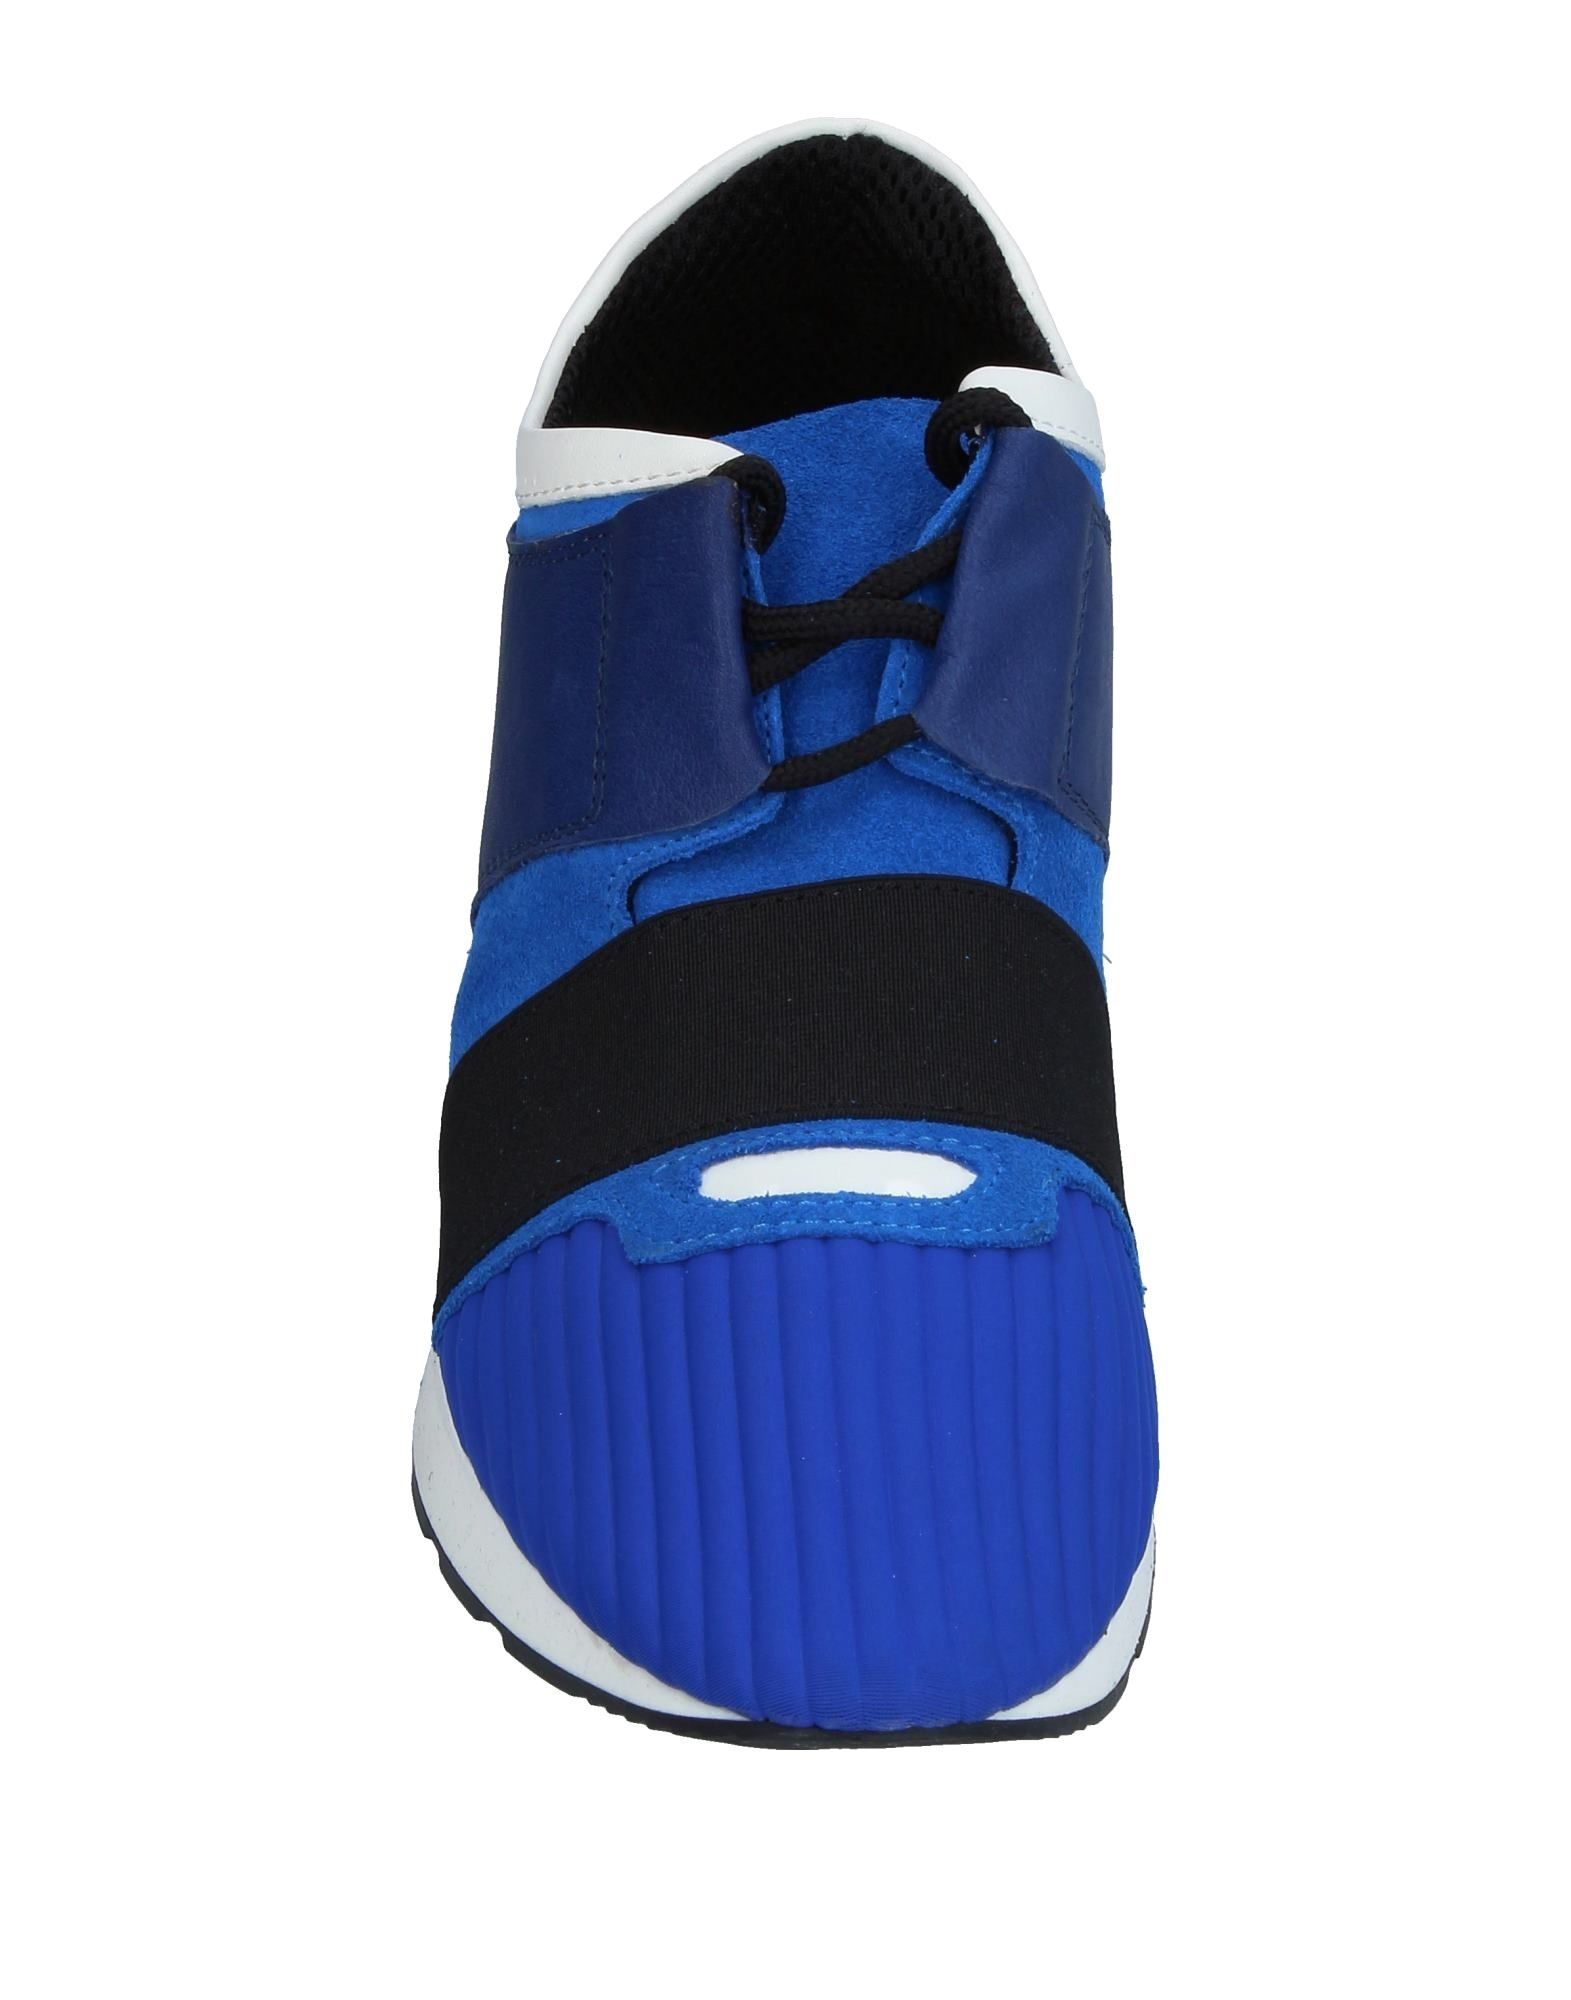 Sneakers Bottega Marchigiana Femme - Sneakers Bottega Marchigiana sur